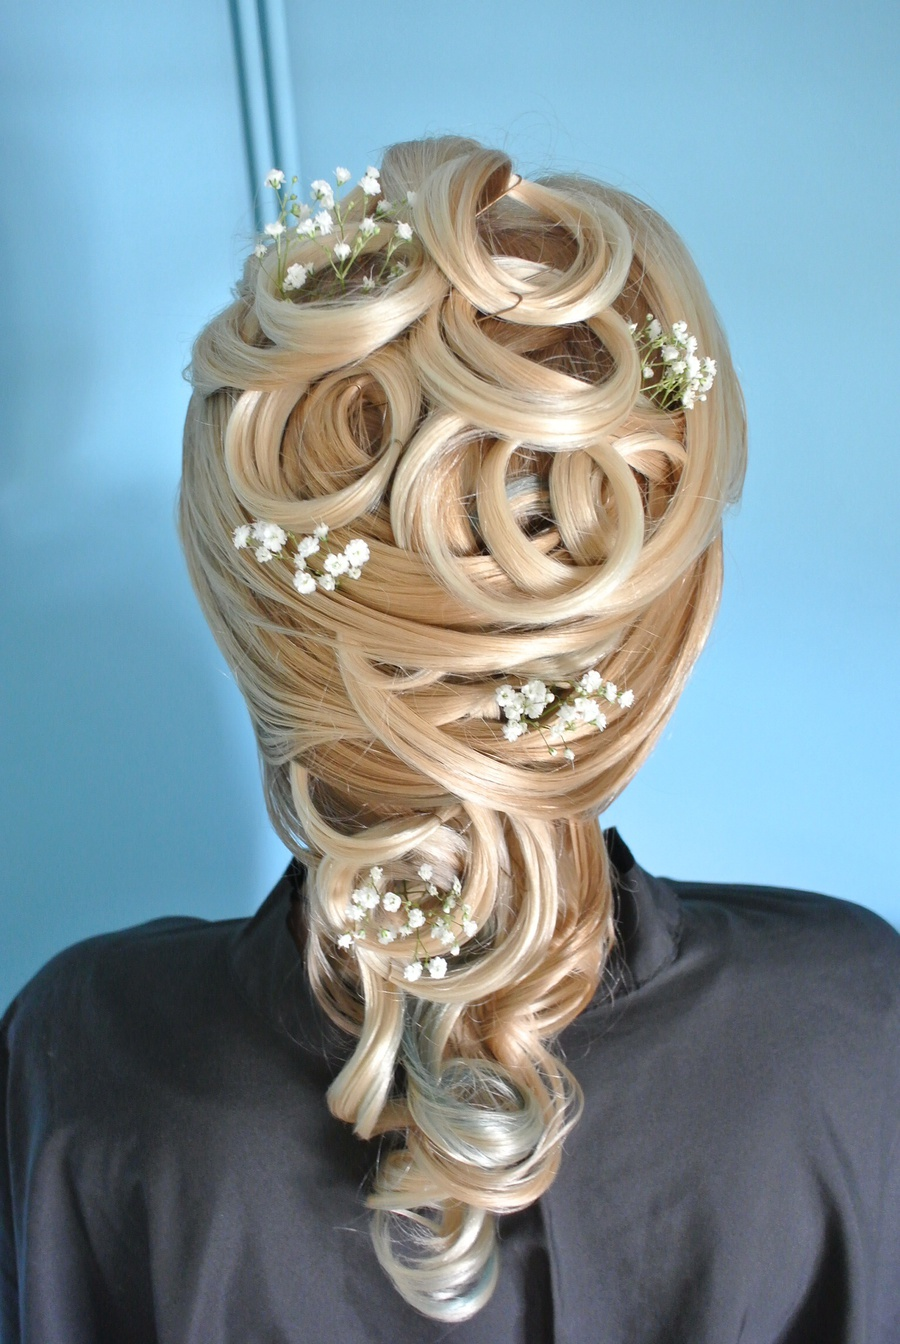 Bridal Idea  / Hair styling by JennyWest_HairandMua / Uploaded 9th January 2015 @ 10:29 AM